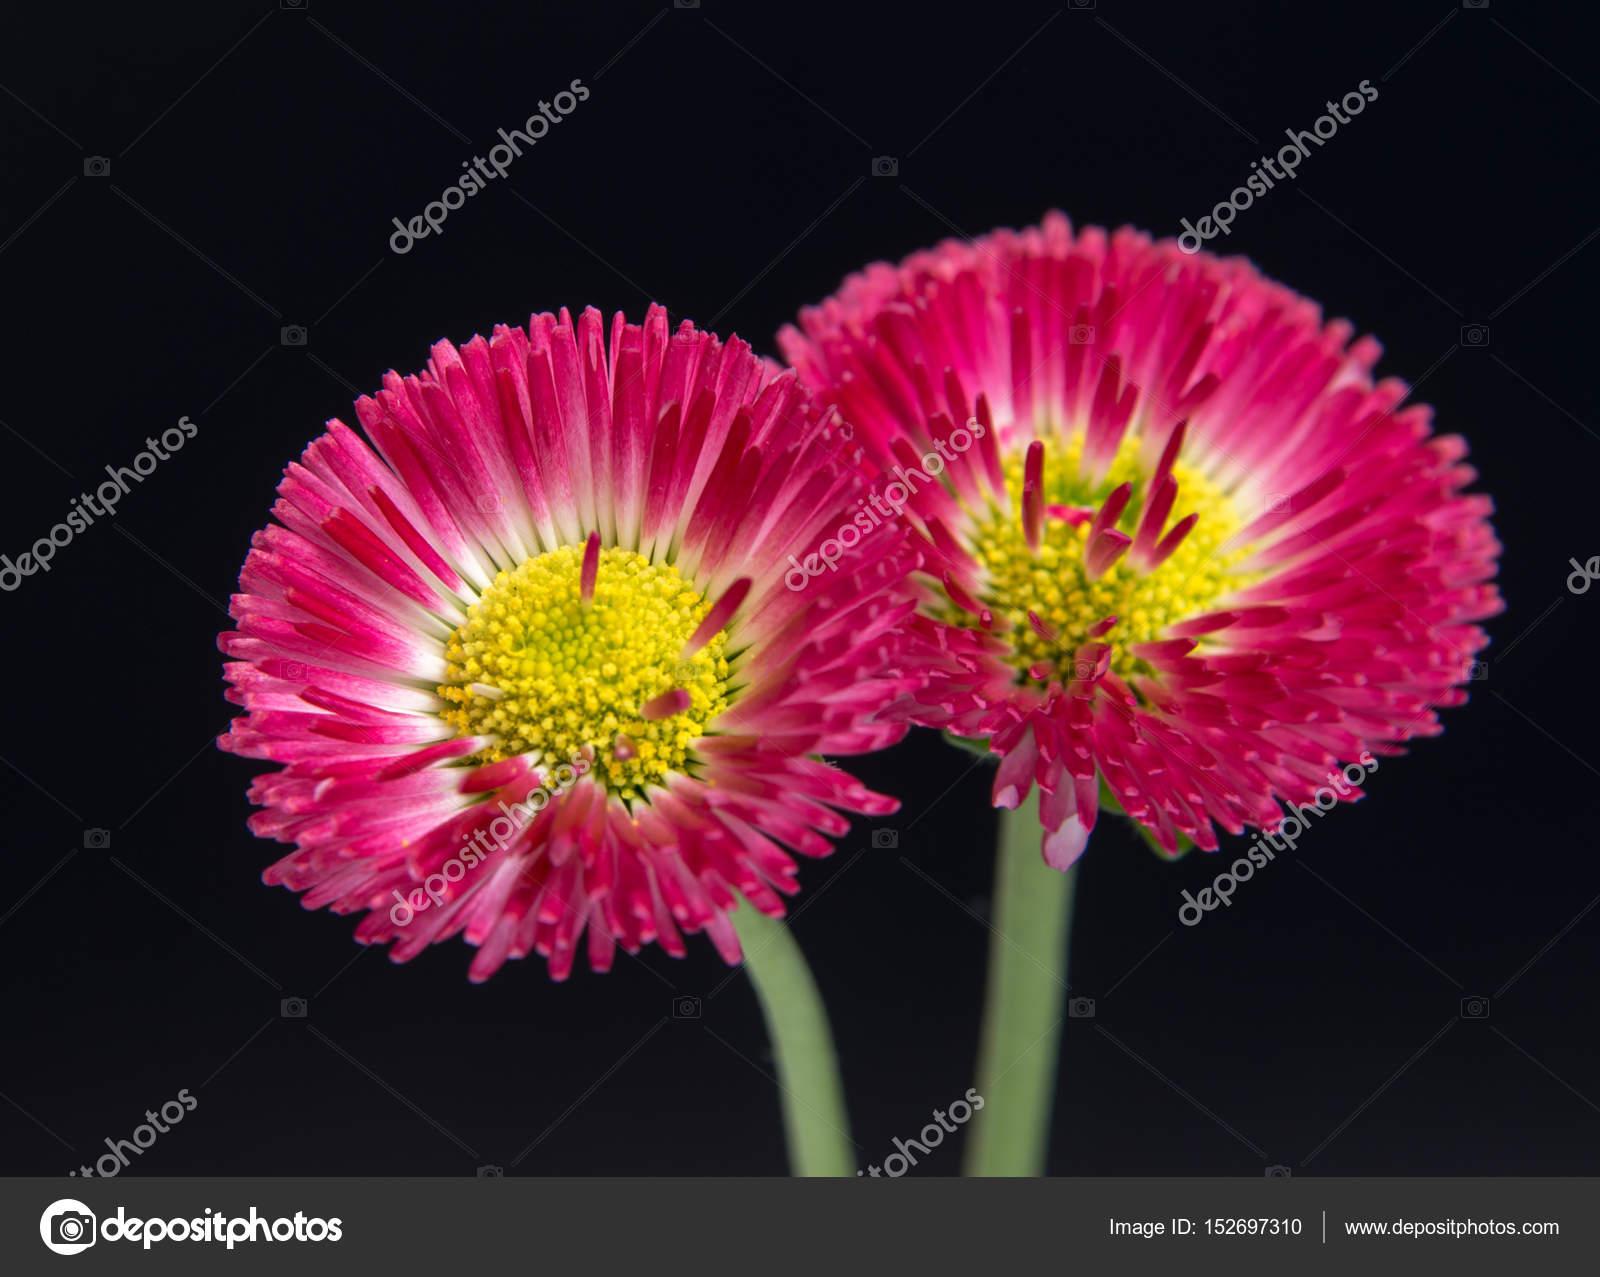 Beautiful daisy flowers isolated on black background stock photo beautiful daisy flowers isolated on black background cutout photo by allaordatiy izmirmasajfo Choice Image